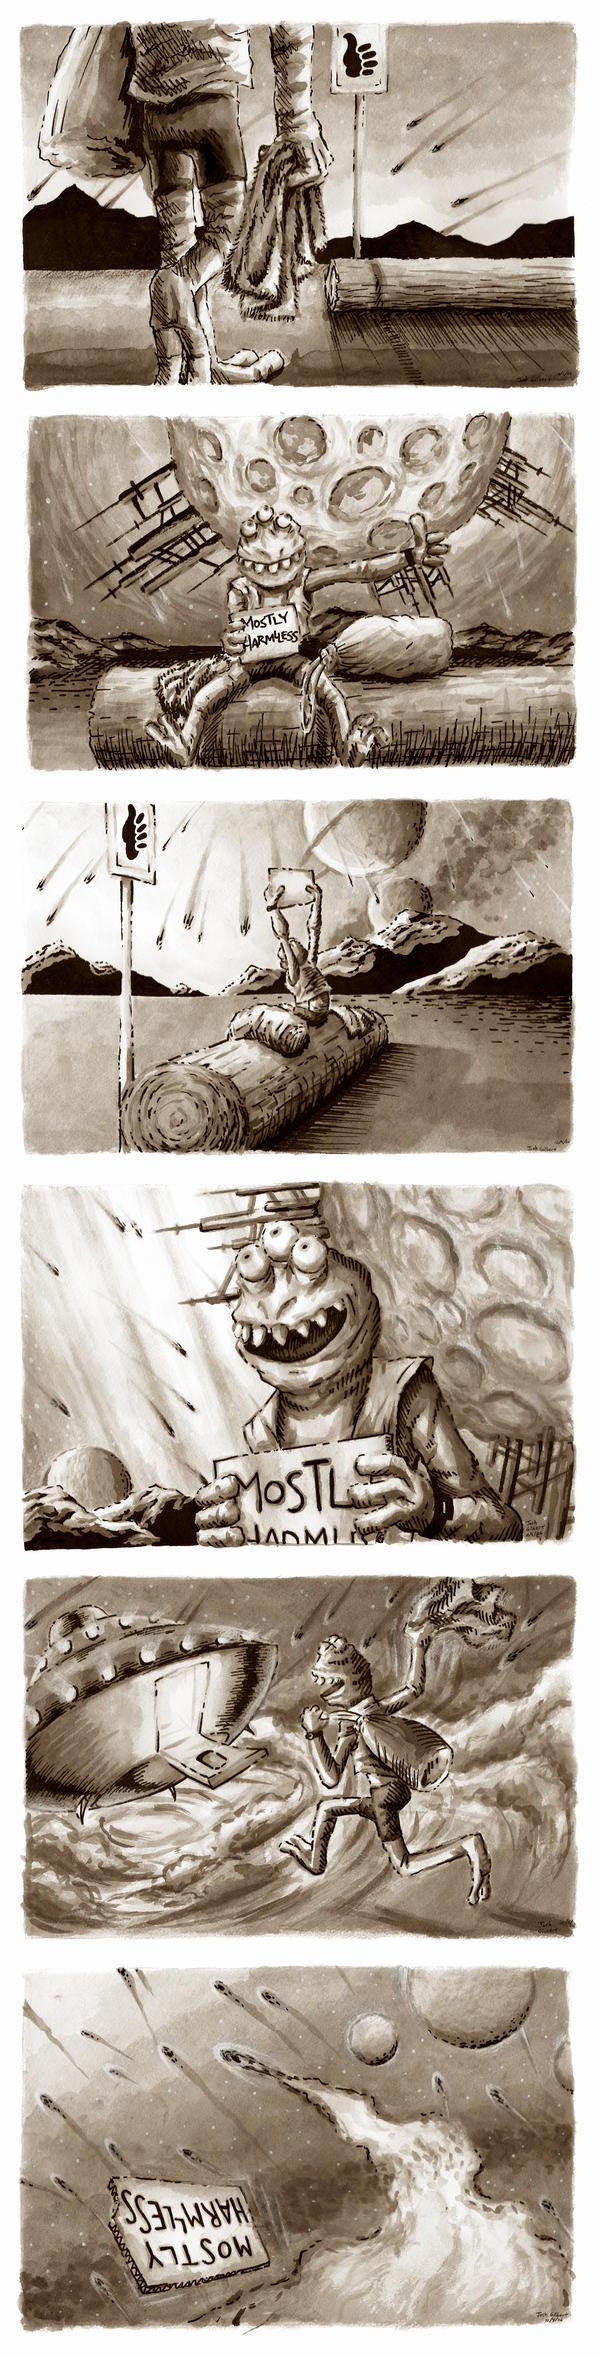 The Travels of Douglas, Part I by shokxone-studios